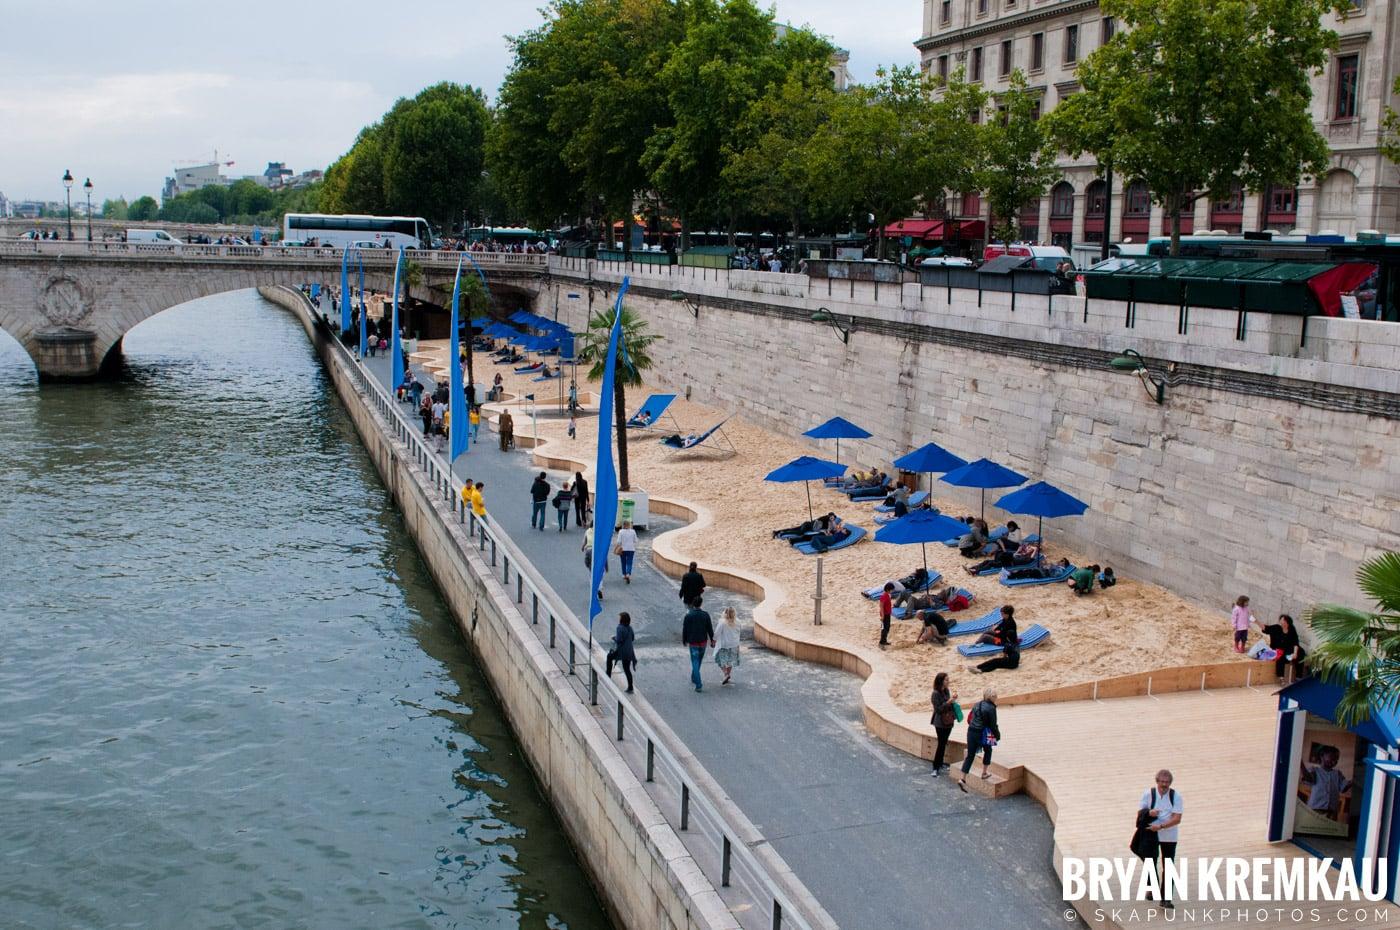 Paris, France Honeymoon - Day 4 - 7.21.11 (9)